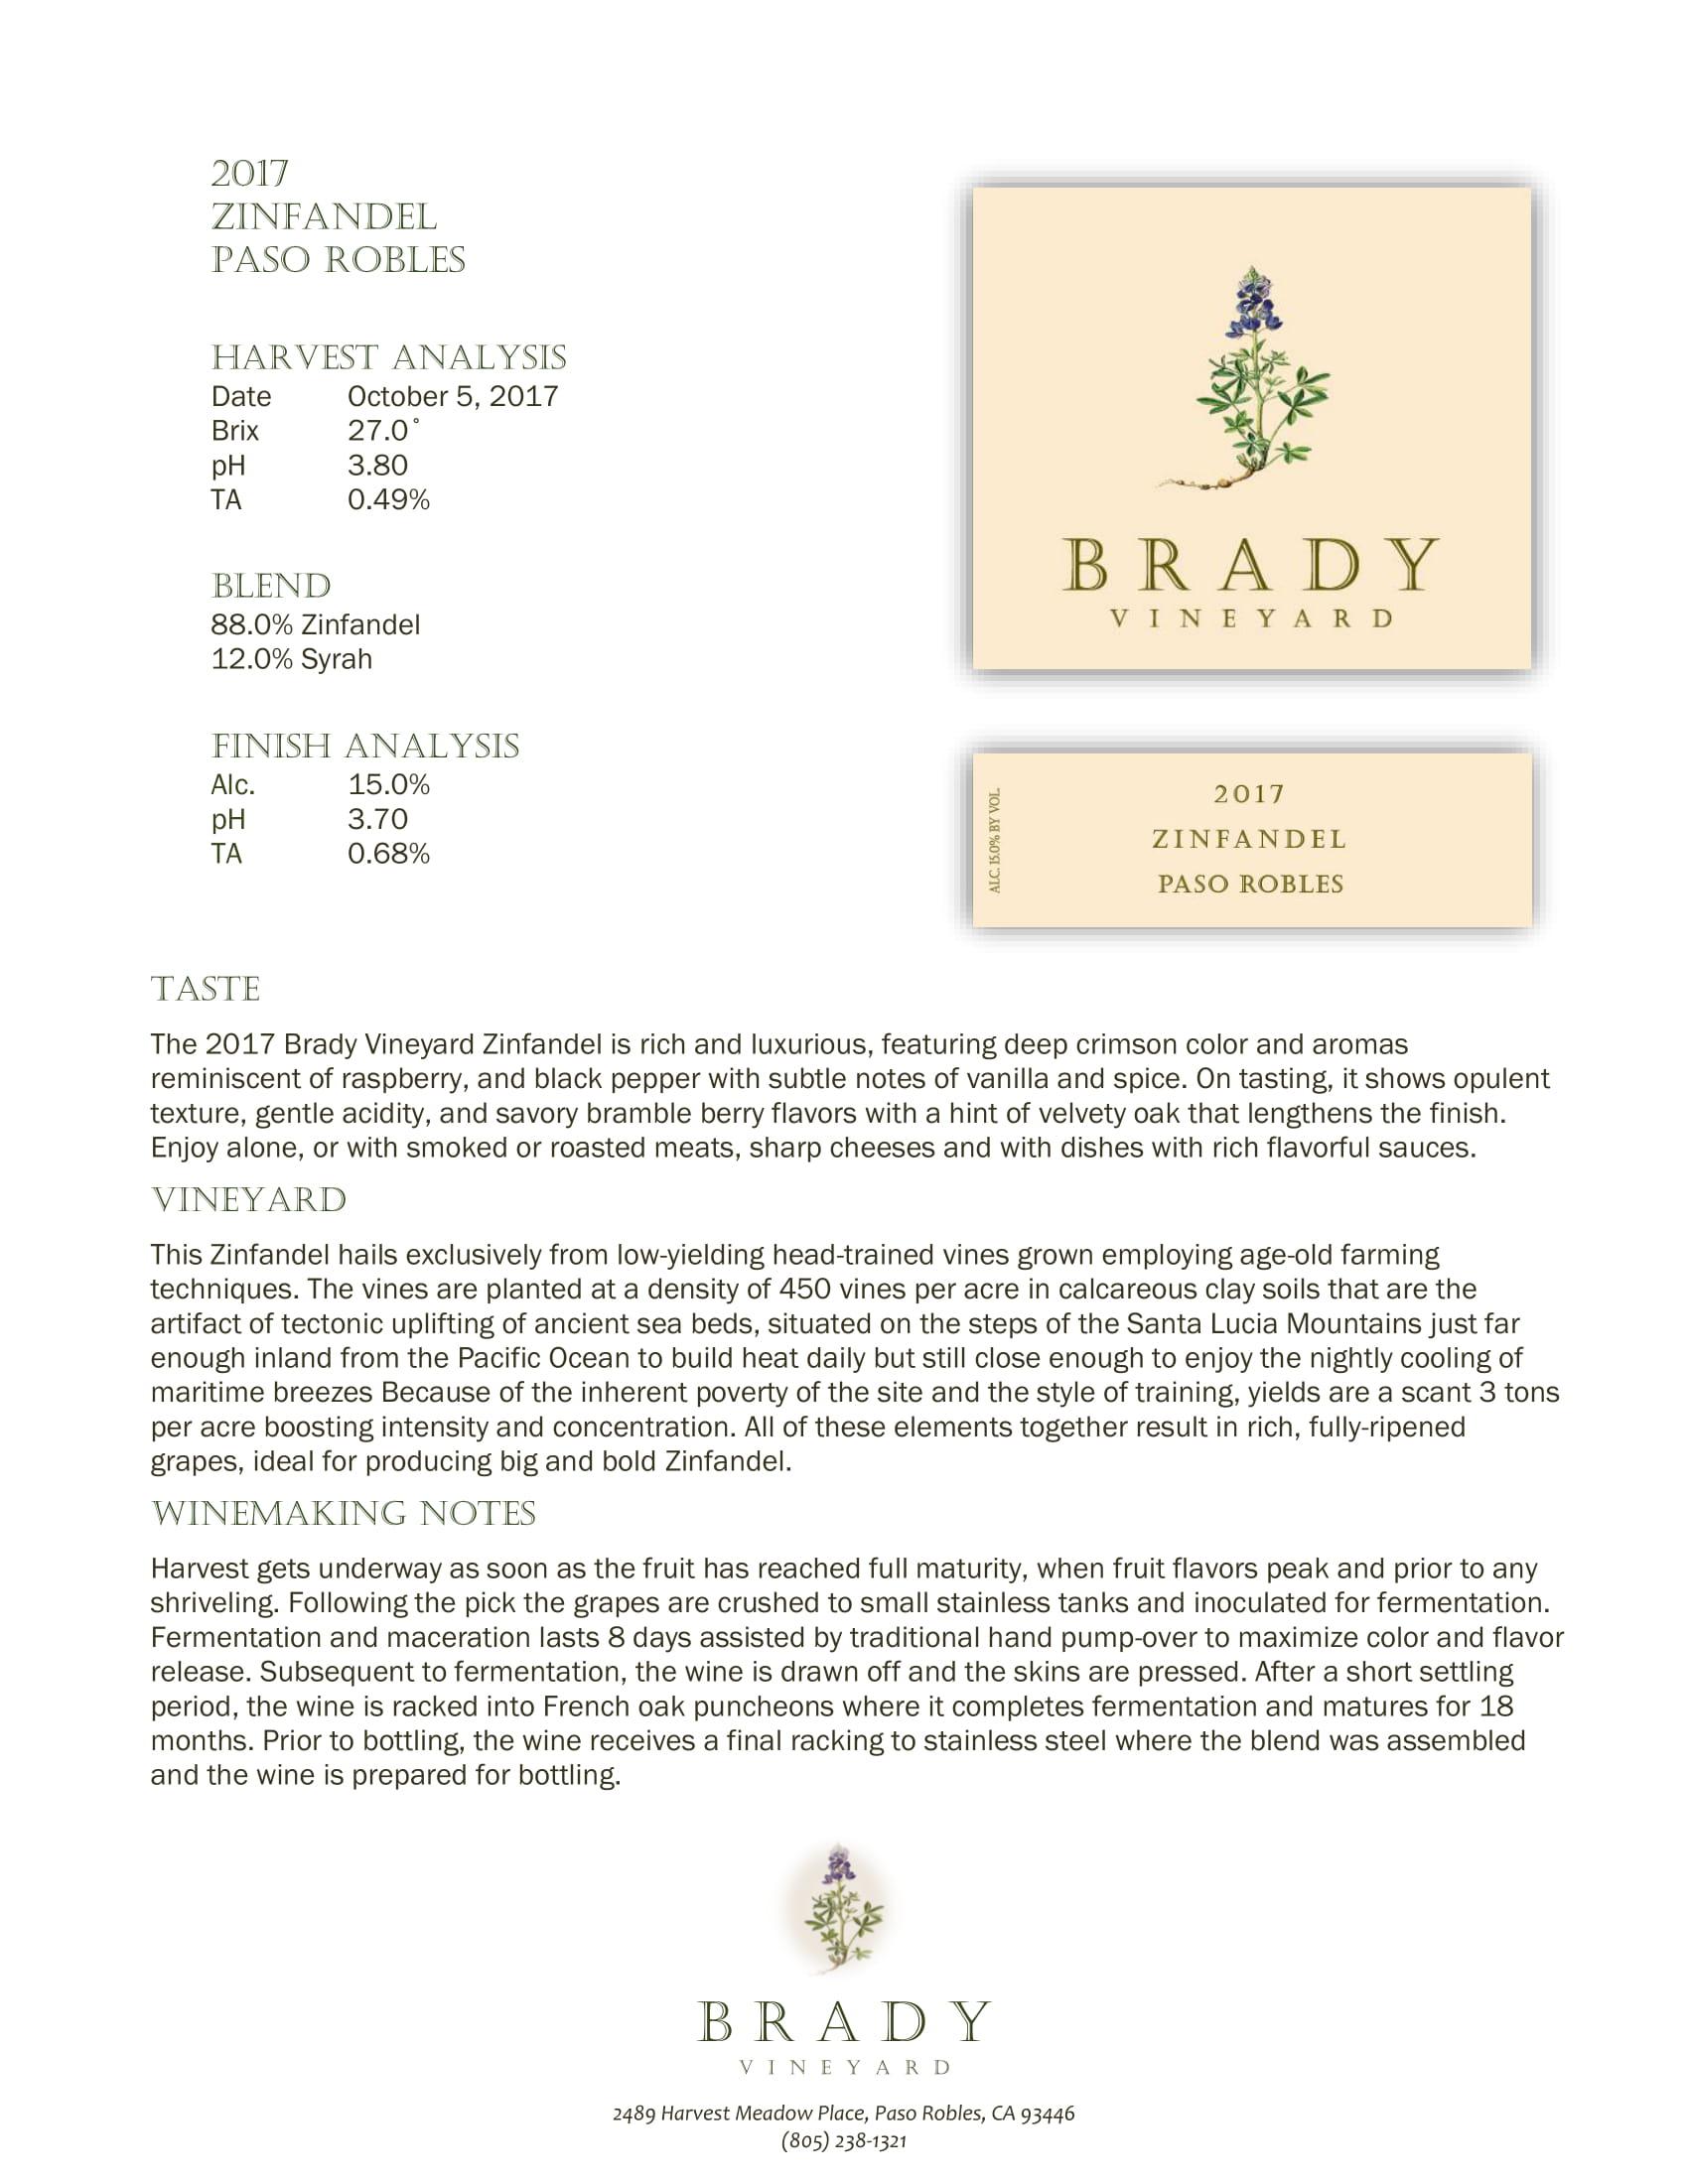 Brady Vineyards Zinfandel Sell Sheet